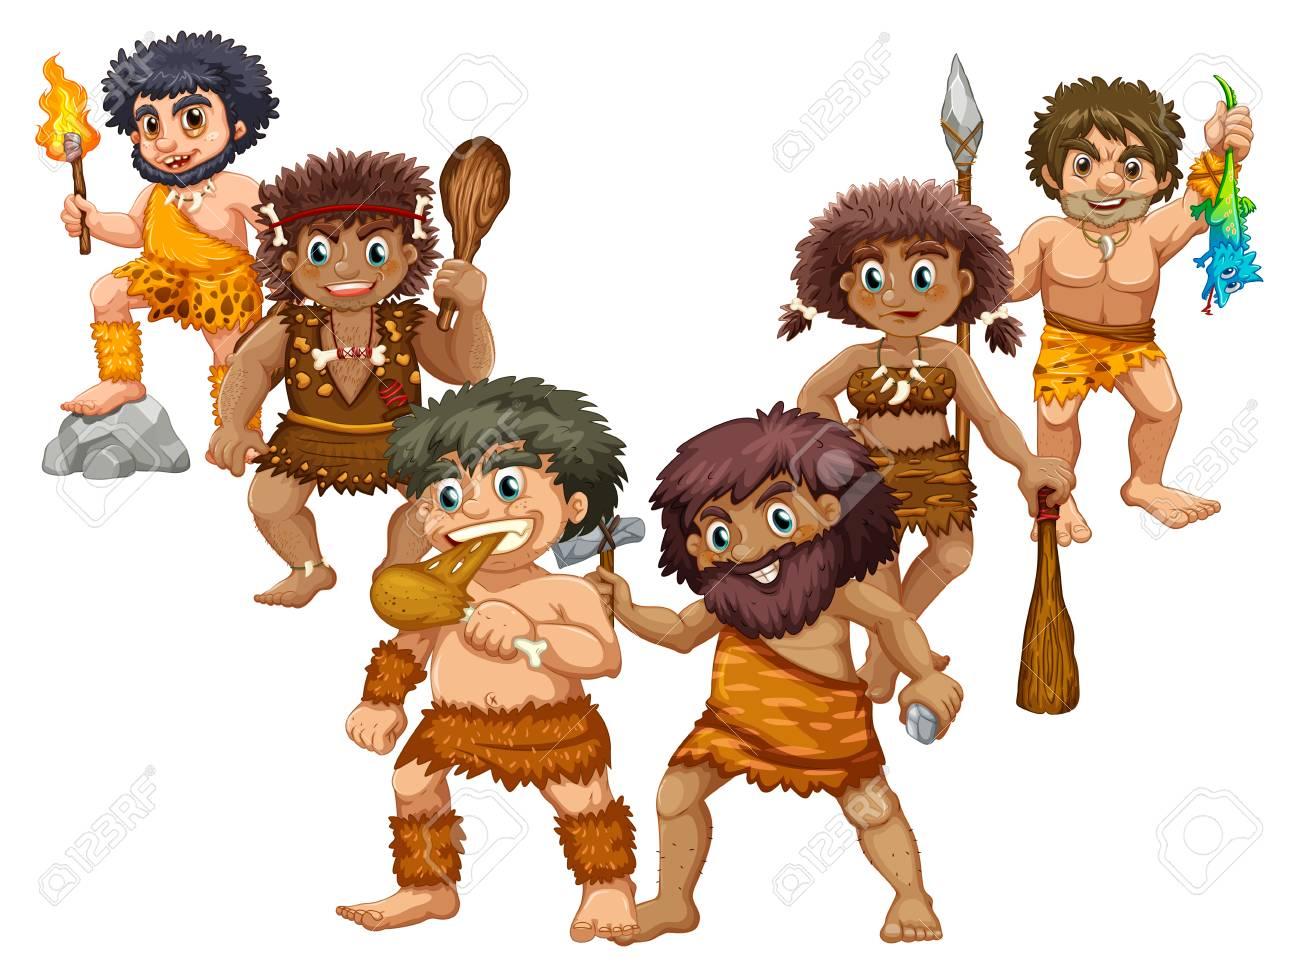 Cavemen in different positions illustration - 74028561